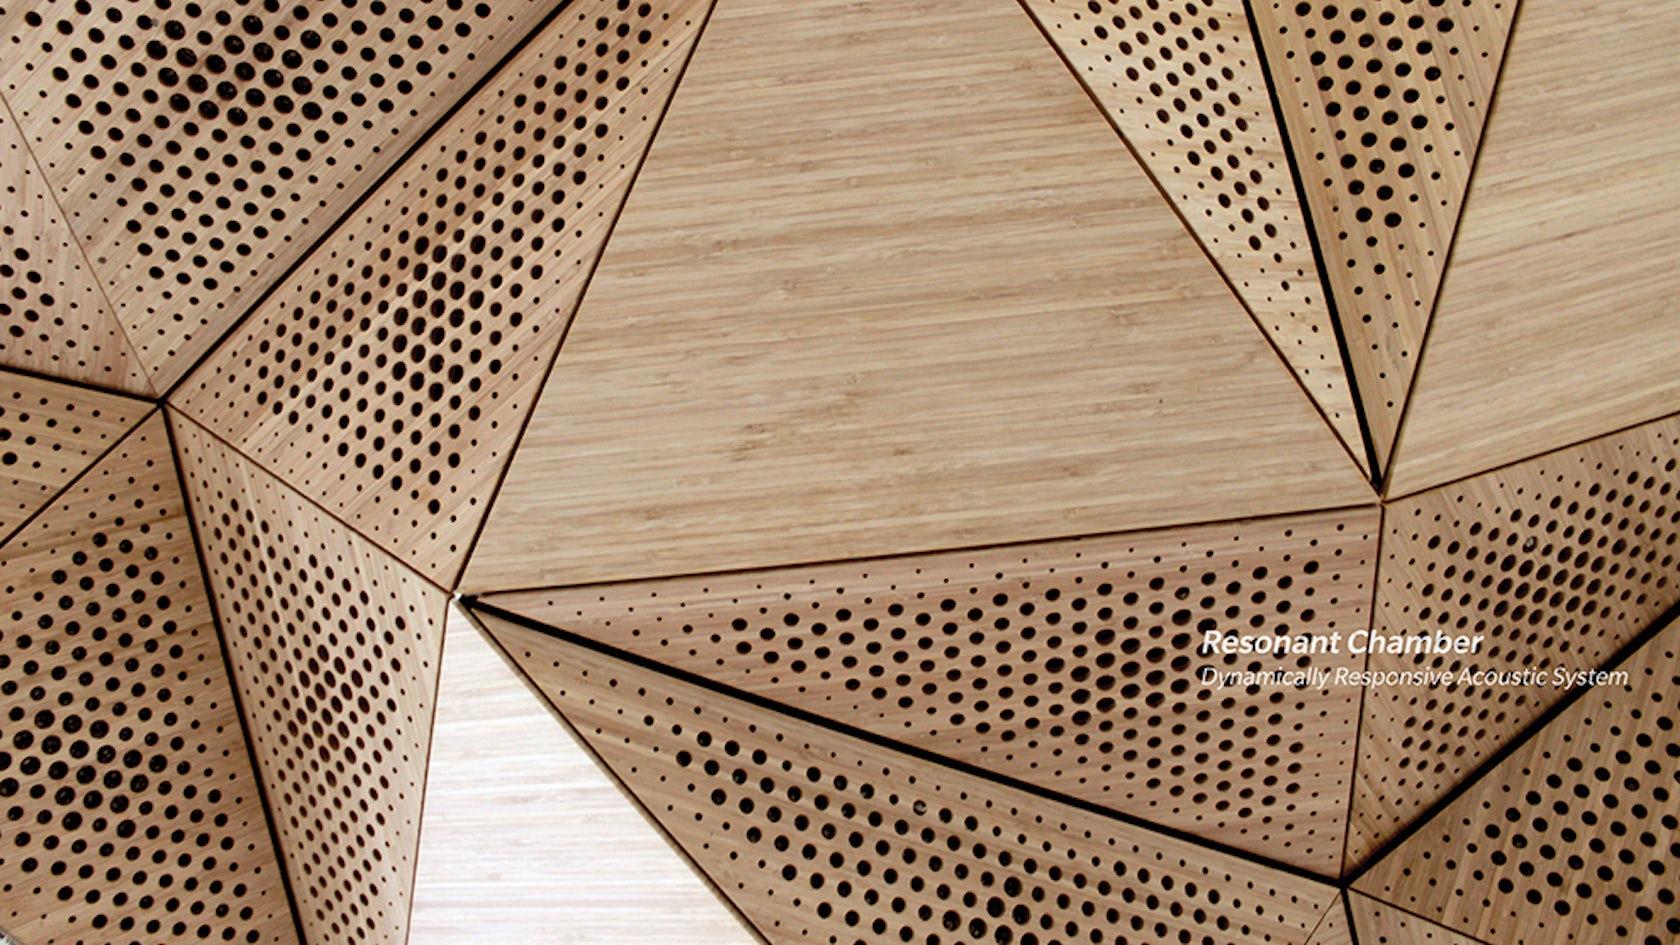 Resonant chamber architizer - Interior design jobs in michigan ...